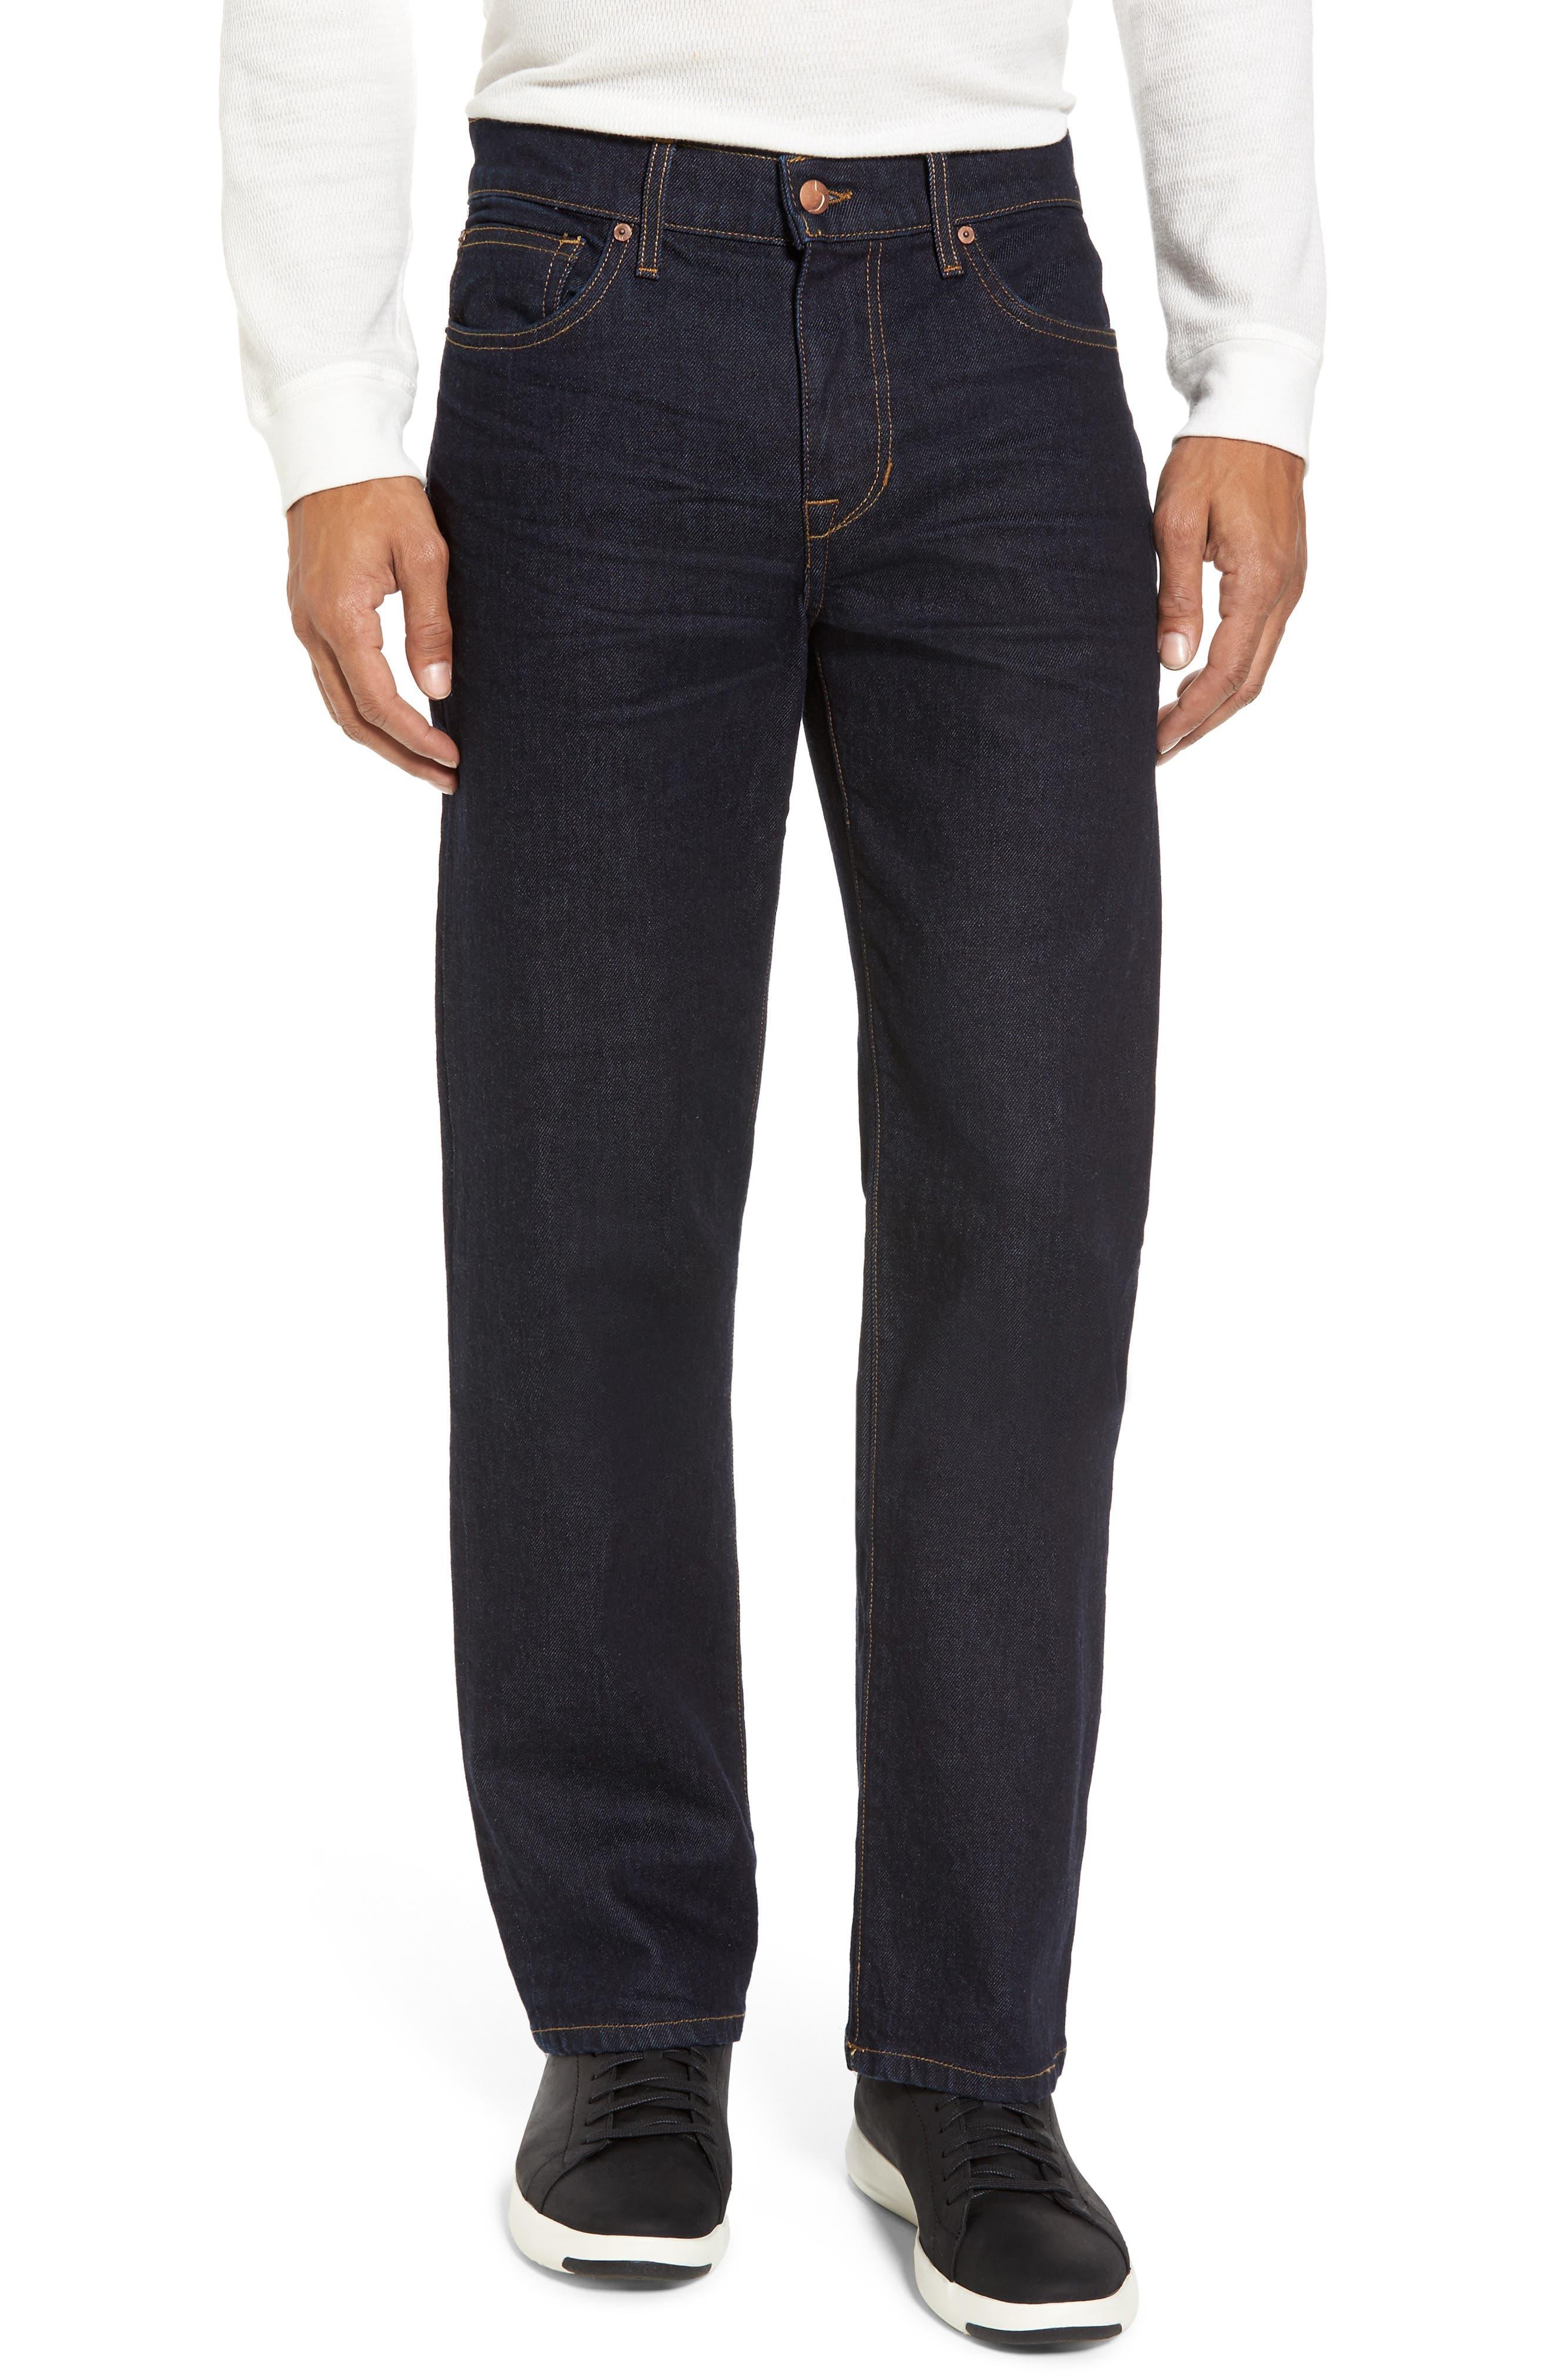 Brixton Slim Straight Leg Jeans,                             Main thumbnail 1, color,                             Halford